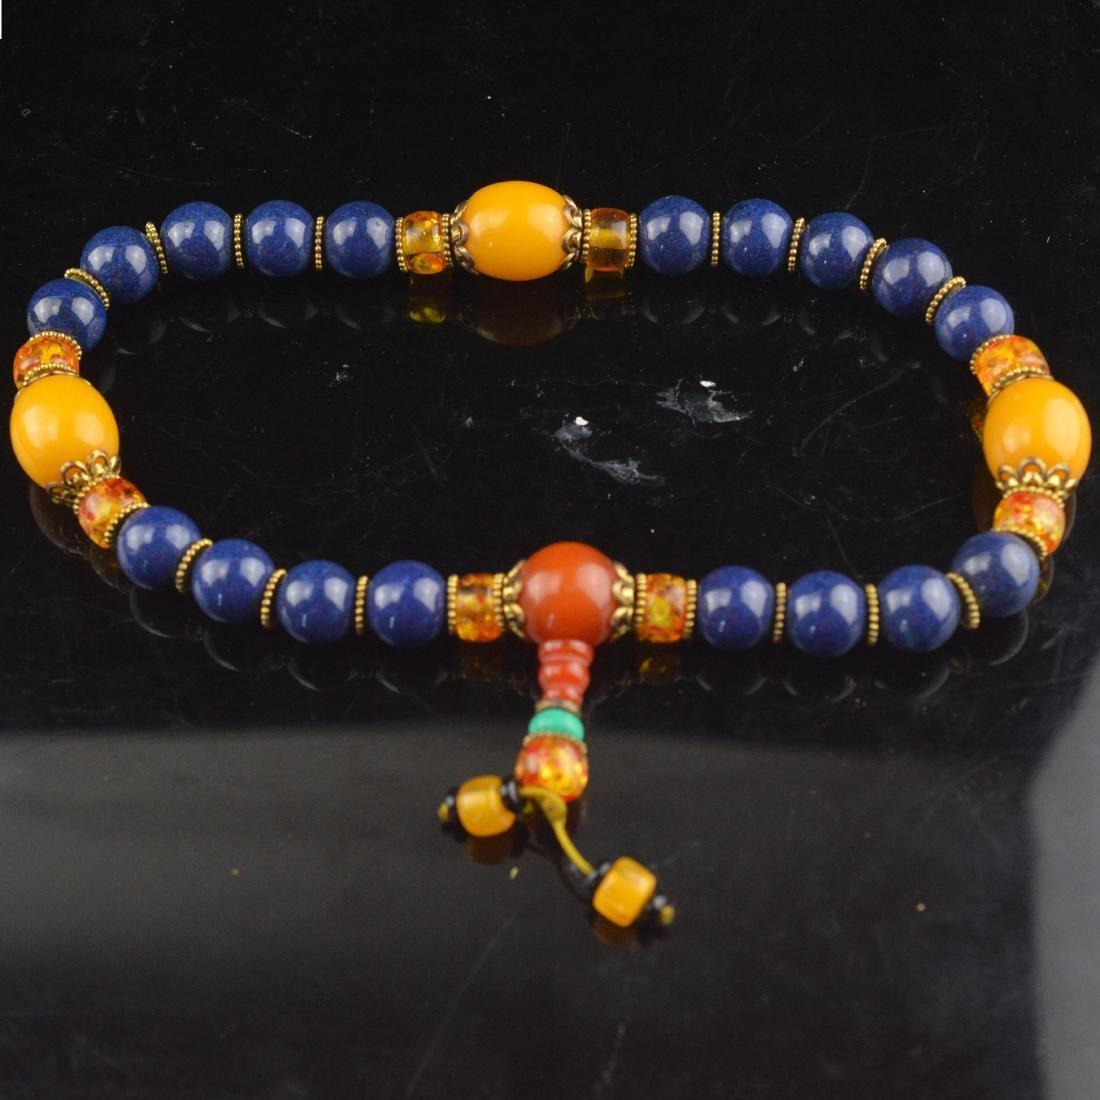 Lapis Lazuli & Amber Bead Wrist Bracelet